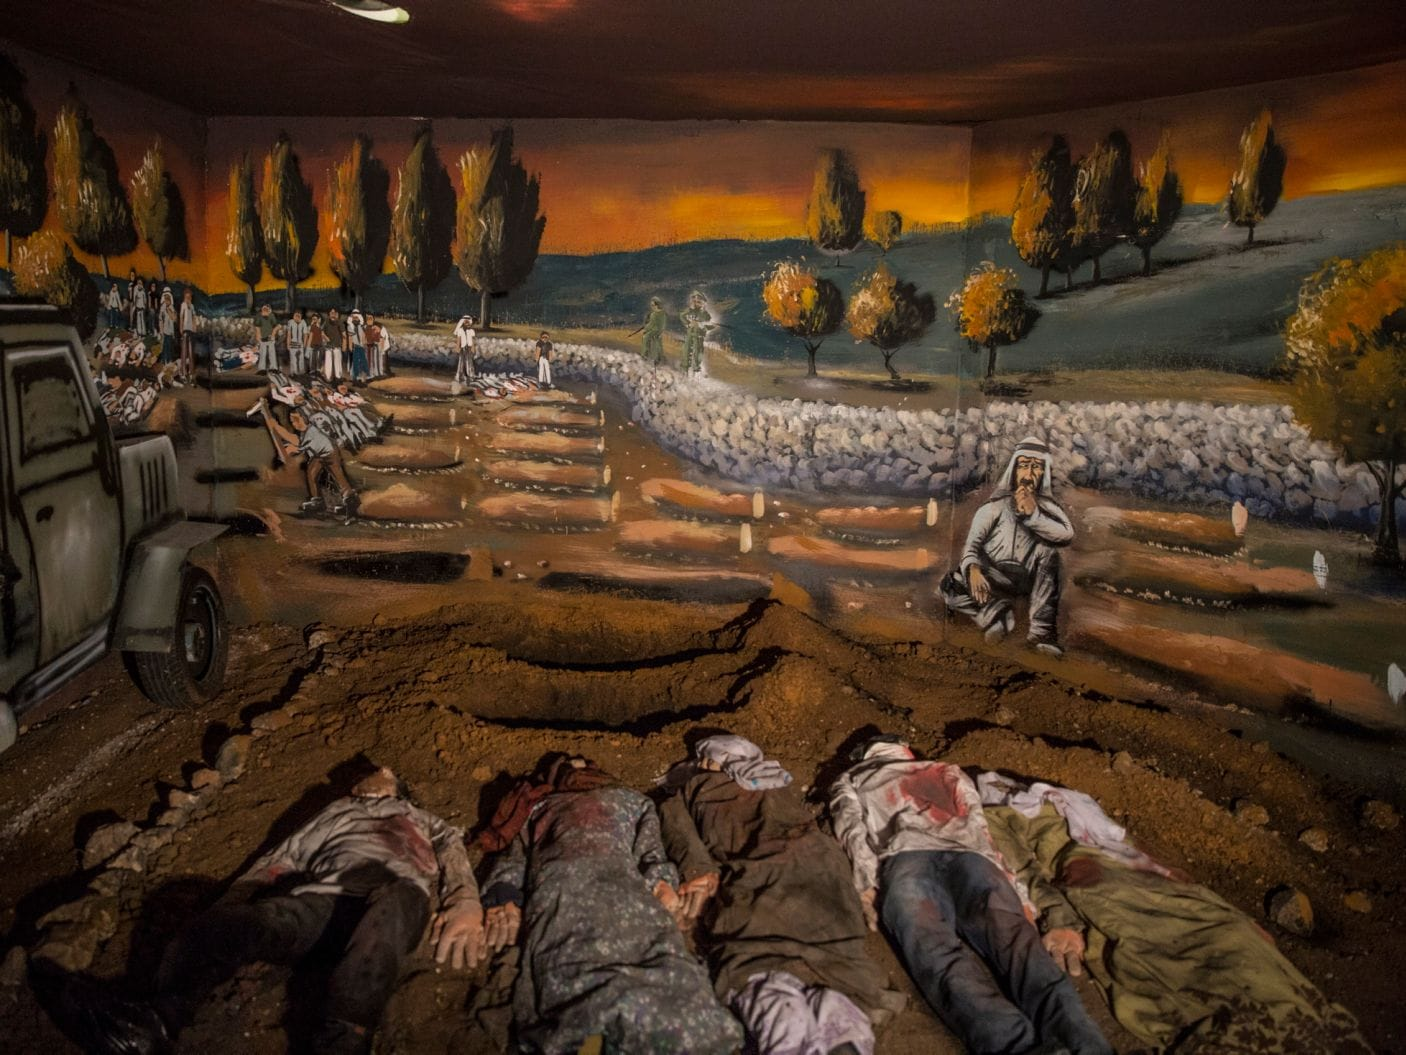 63 anni fa il massacro (impunito) israeliano di Kafr Qasem